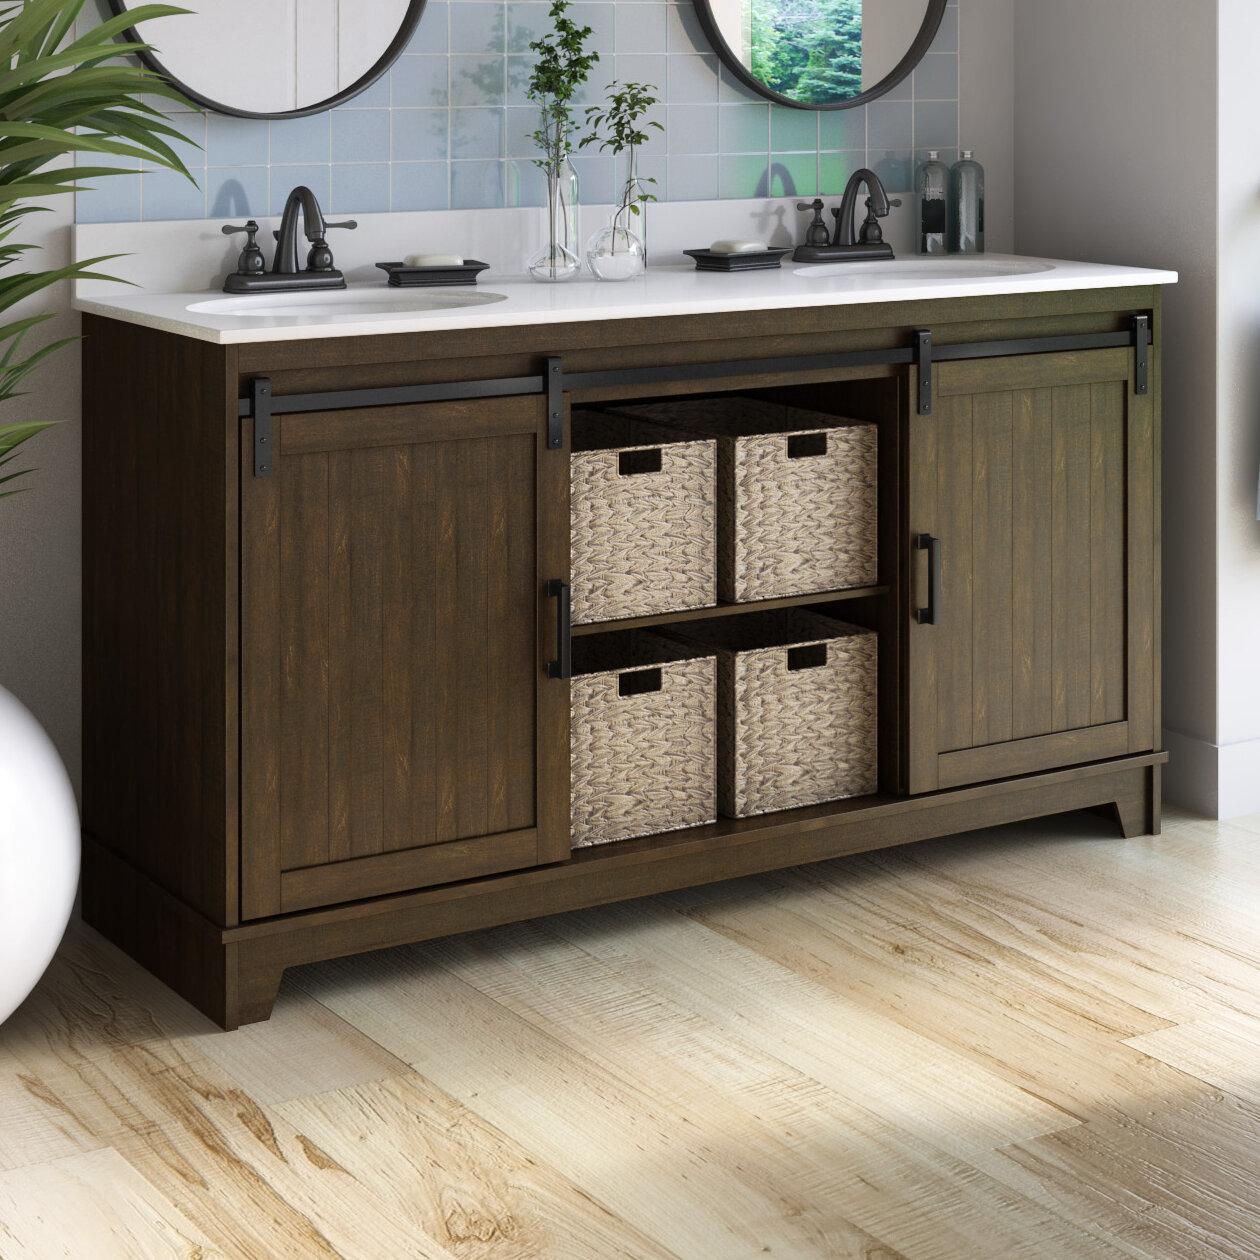 Gracie Oaks Trogdon Sliding Barn Door 60 Double Bathroom Vanity Set Reviews Wayfair